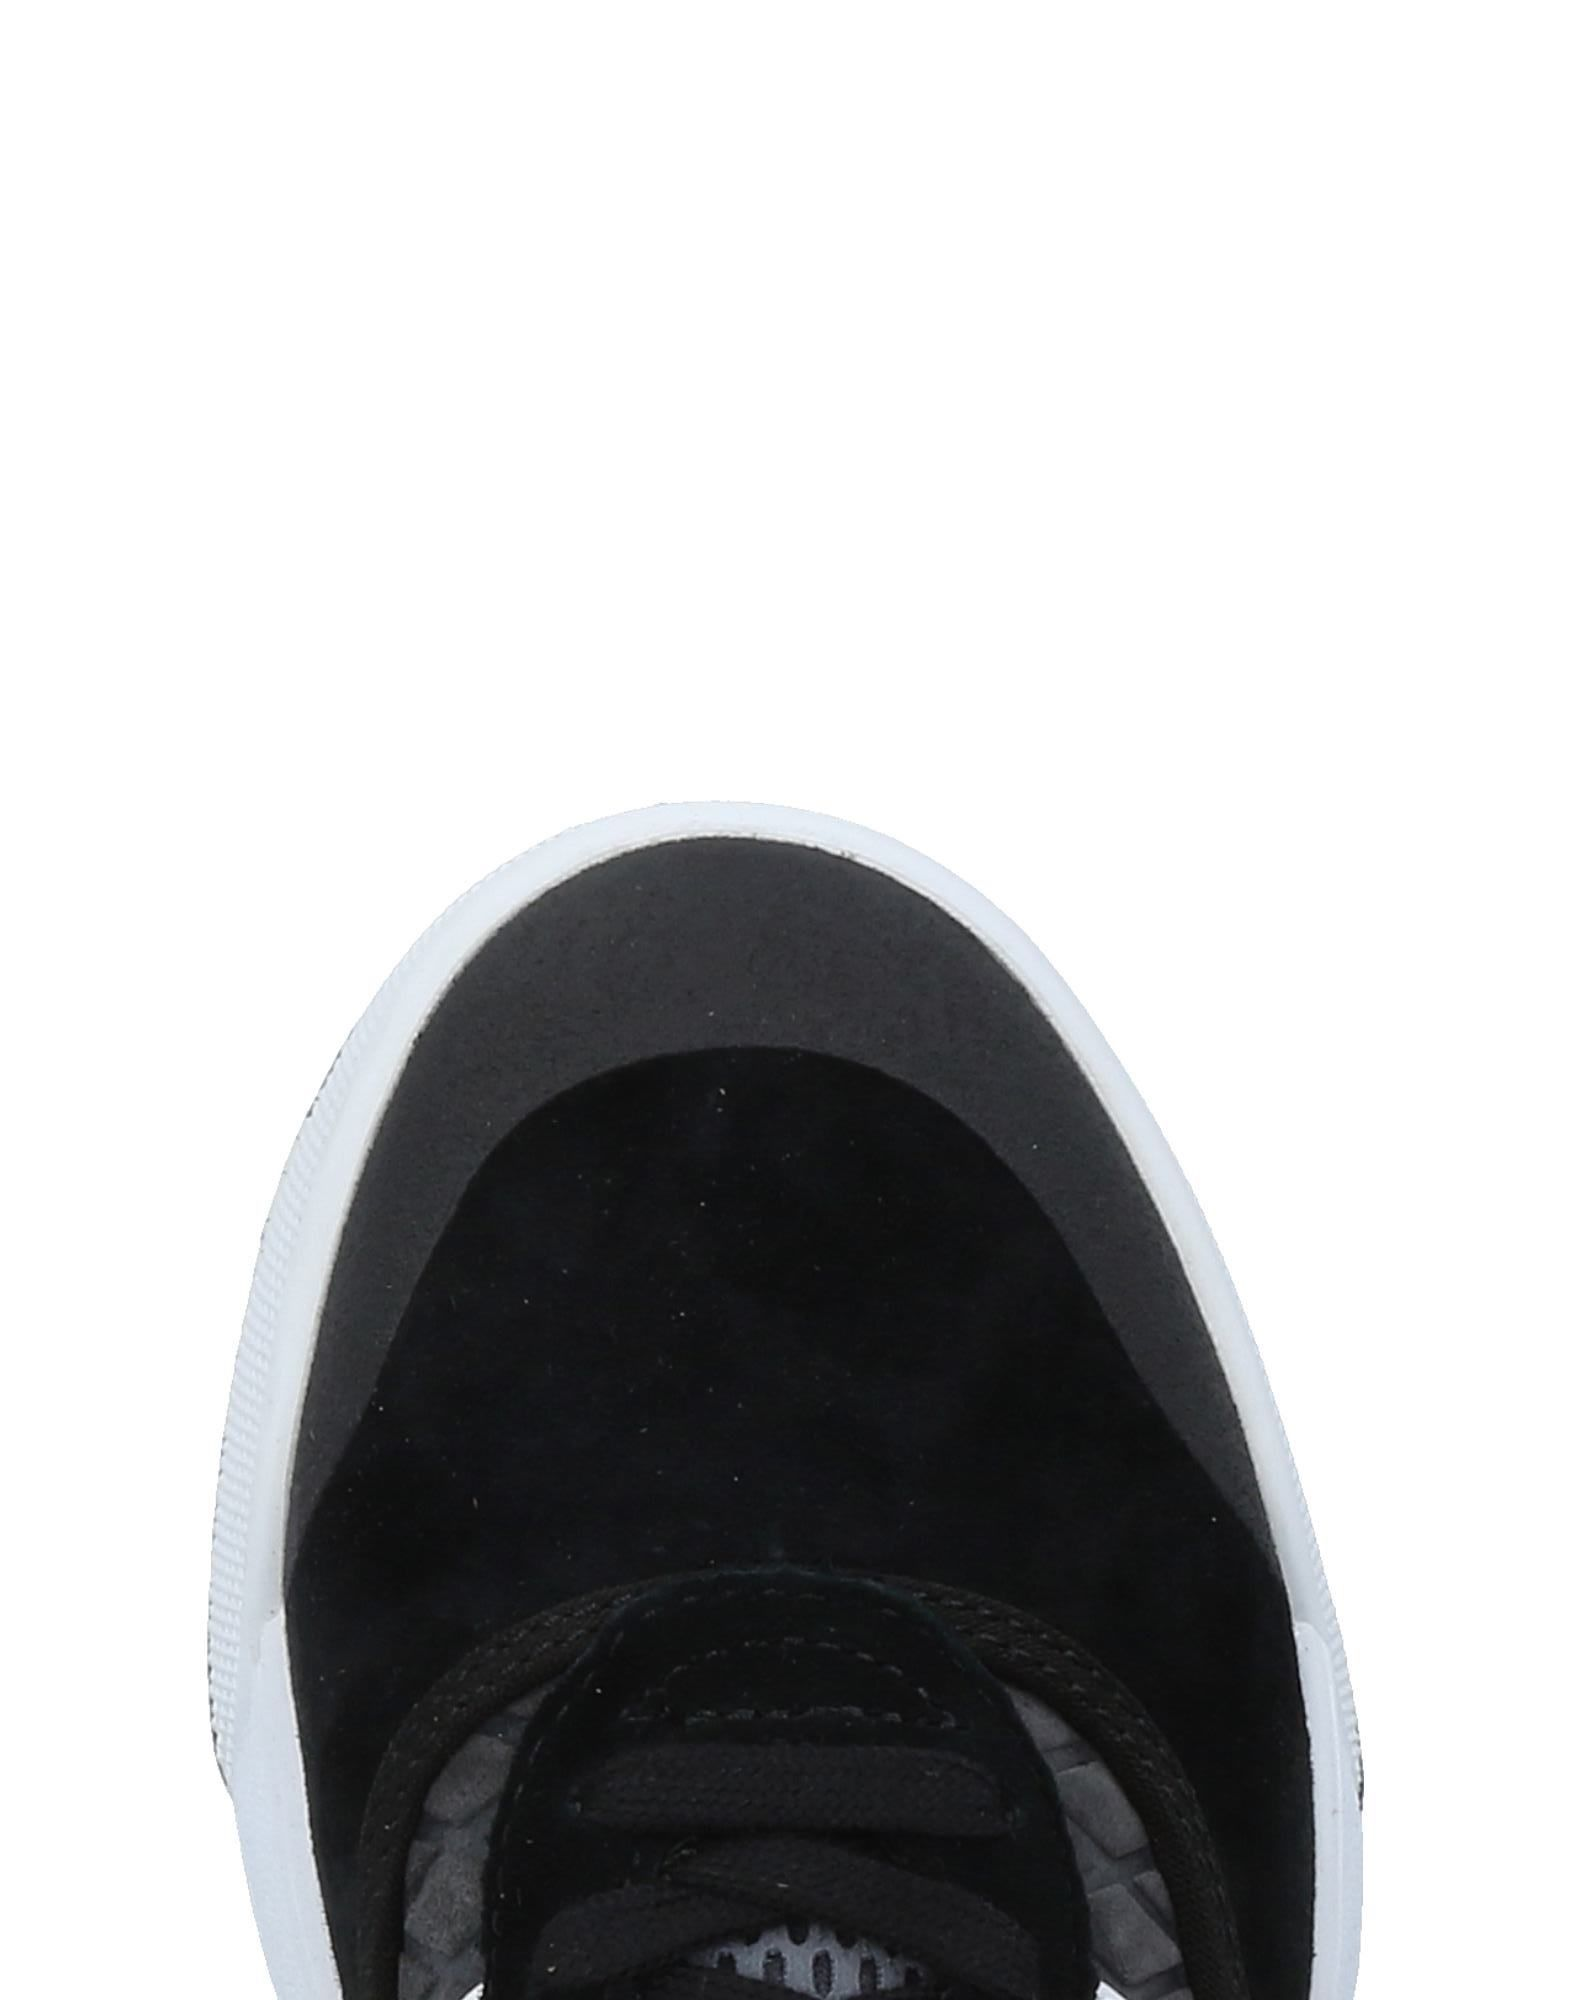 Vans Sneakers Damen  11492263LU Gute Qualität beliebte Schuhe